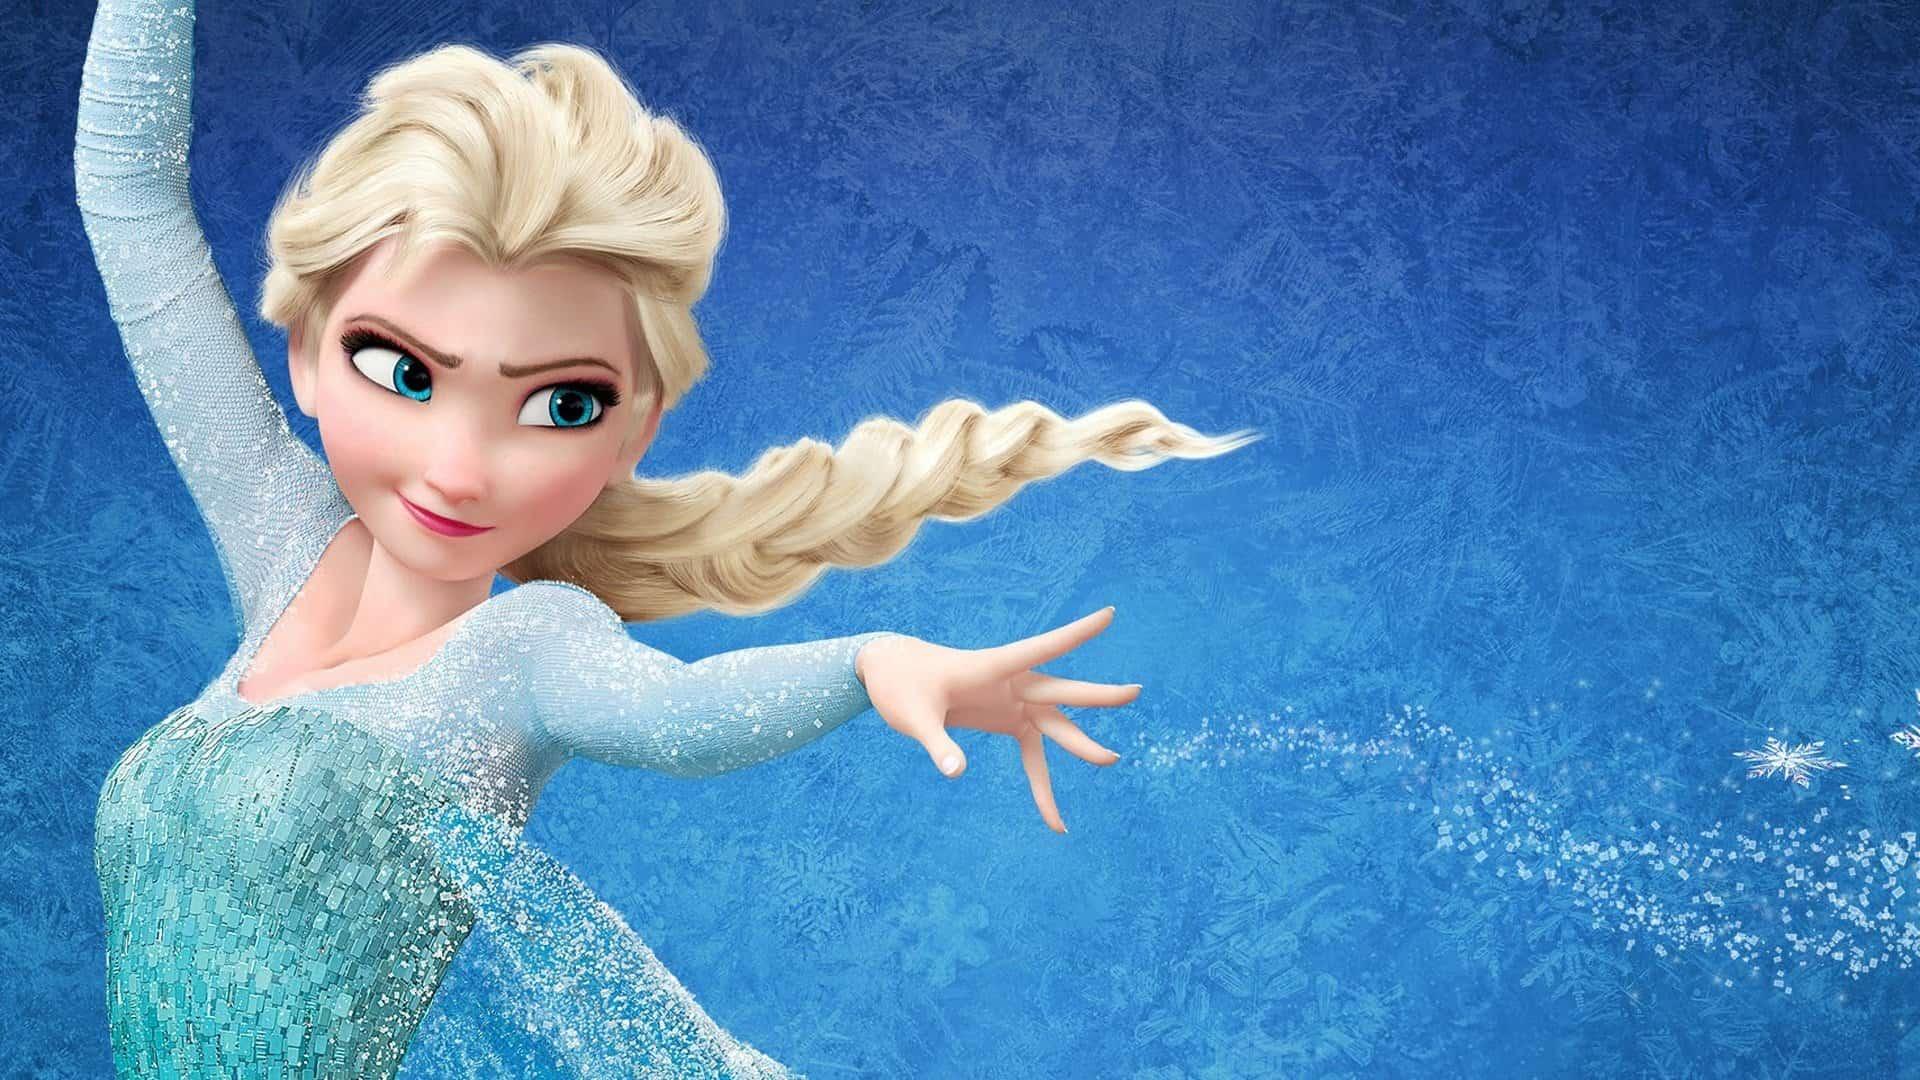 Elsa Frozen Lesbiana, Hay una lesbiana en mi sopa